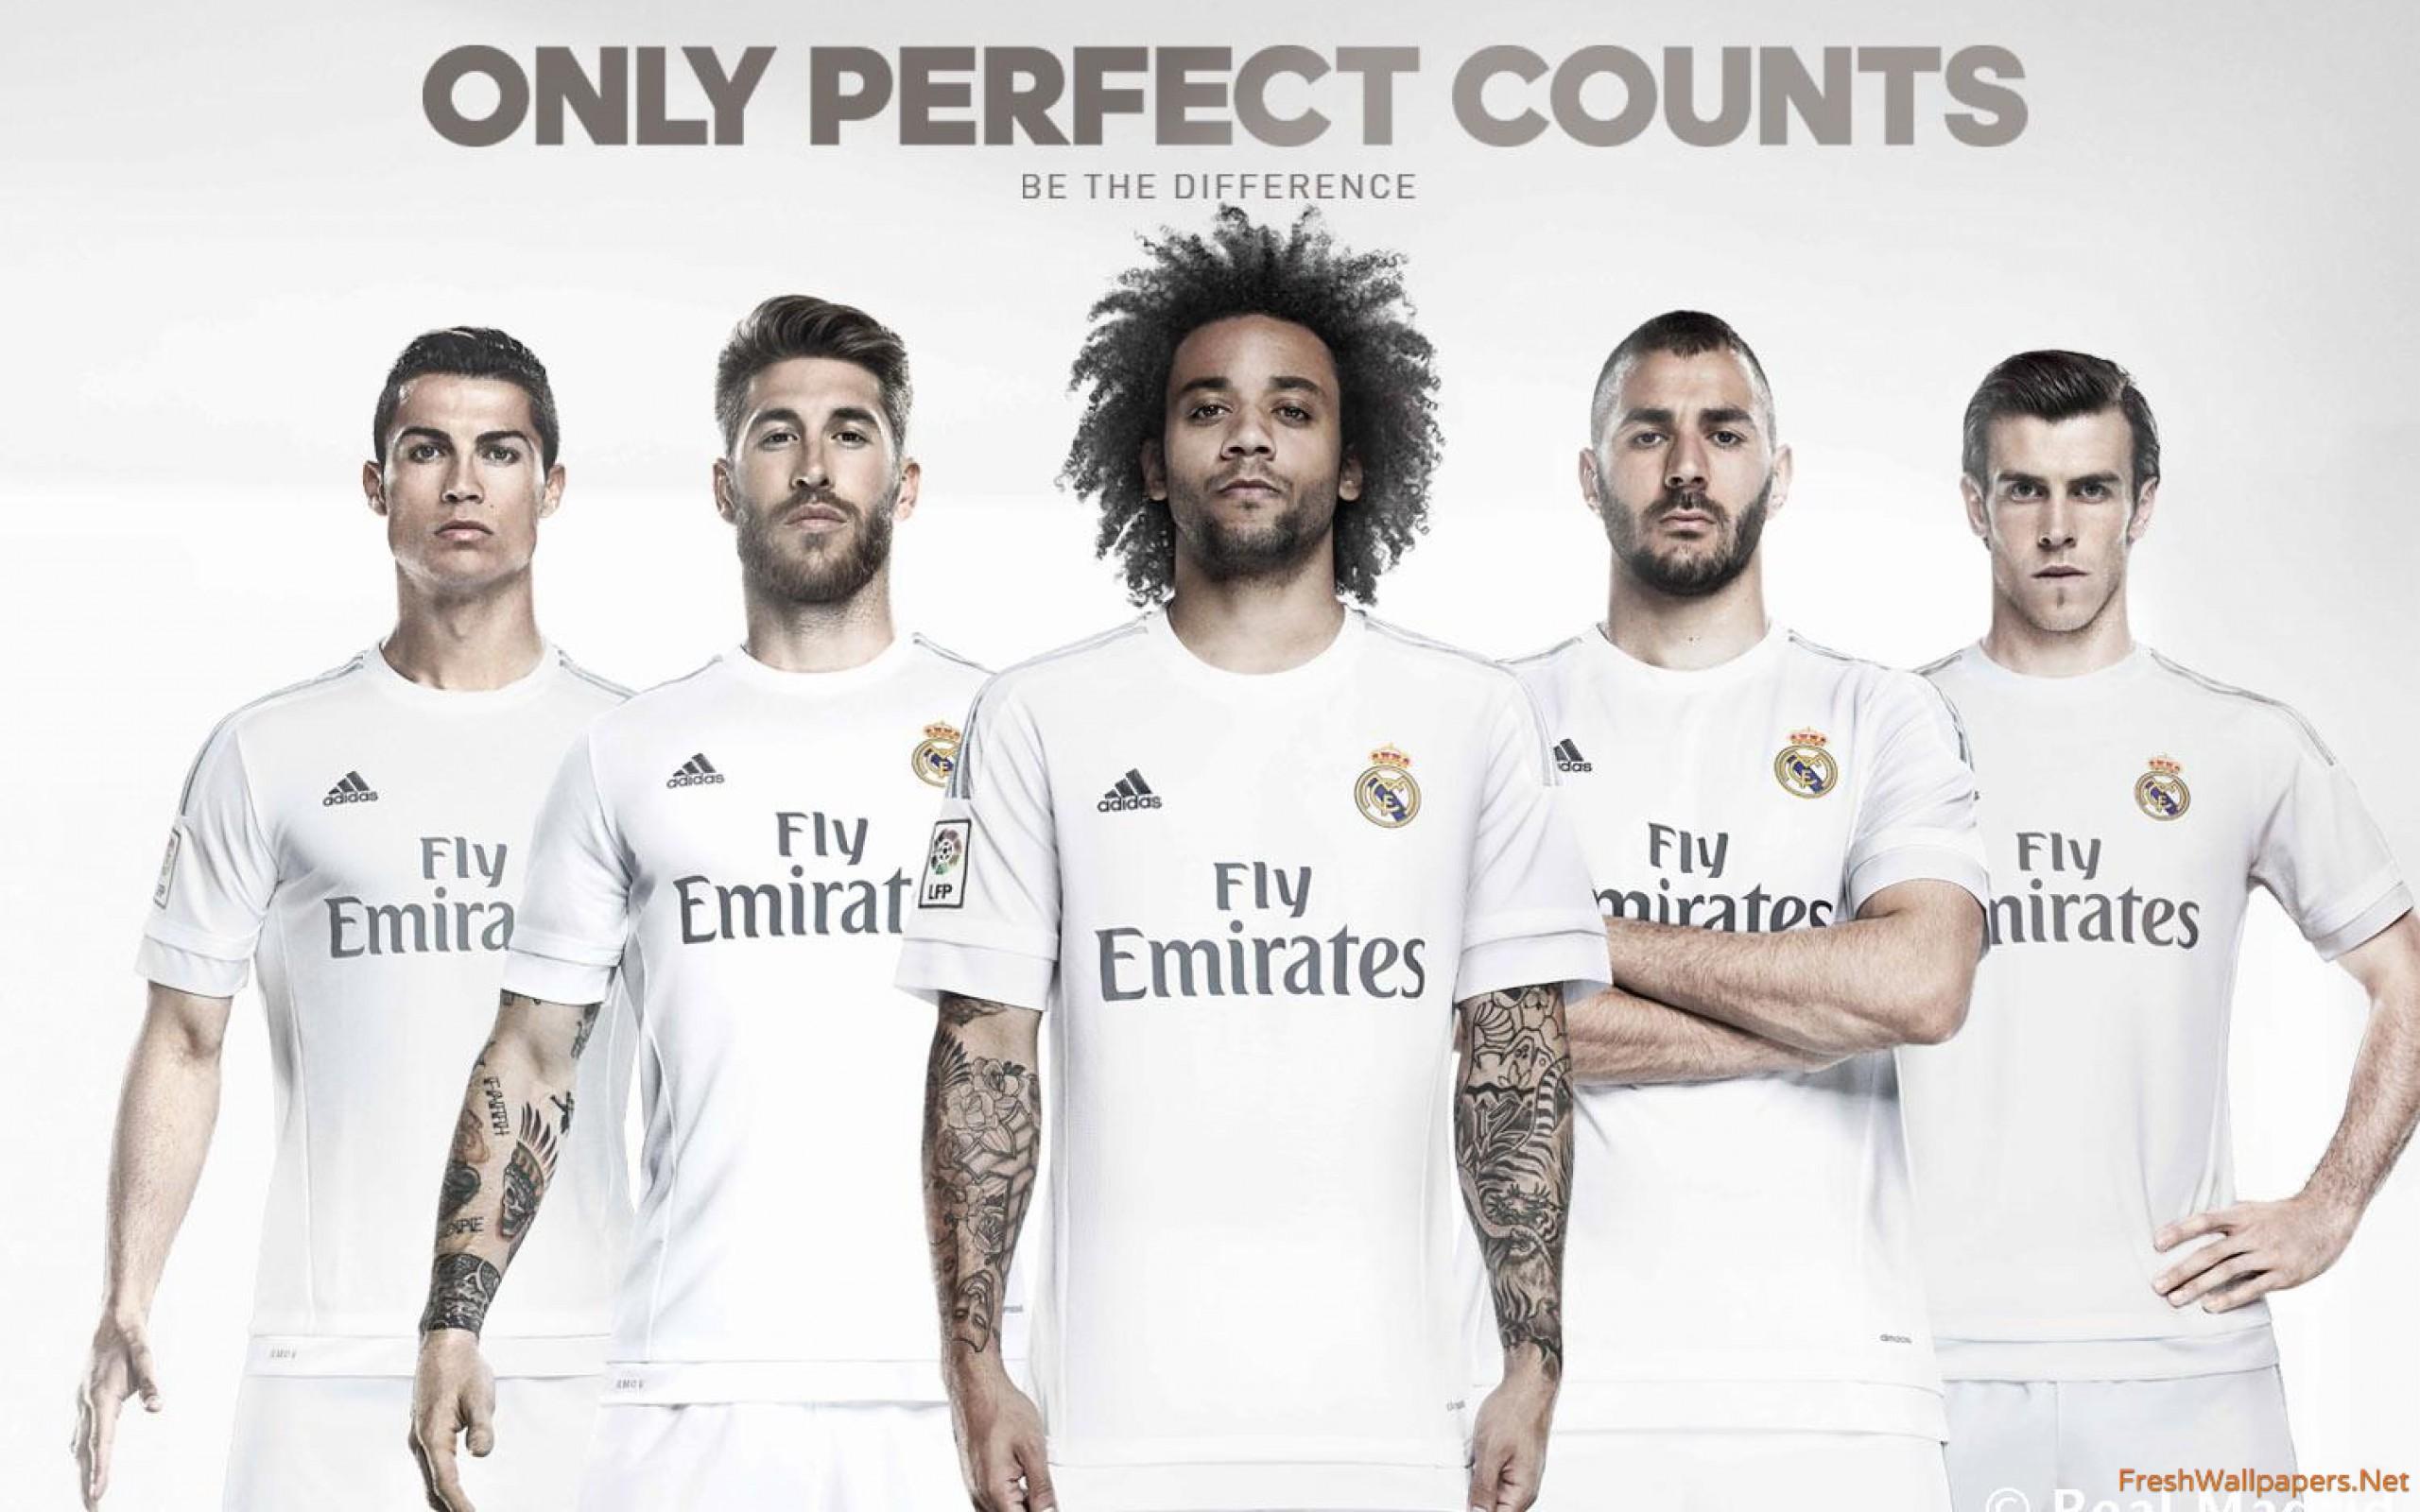 Real Madrid CF 2015 2016 Kit wallpapers Freshwallpapers 2560x1600